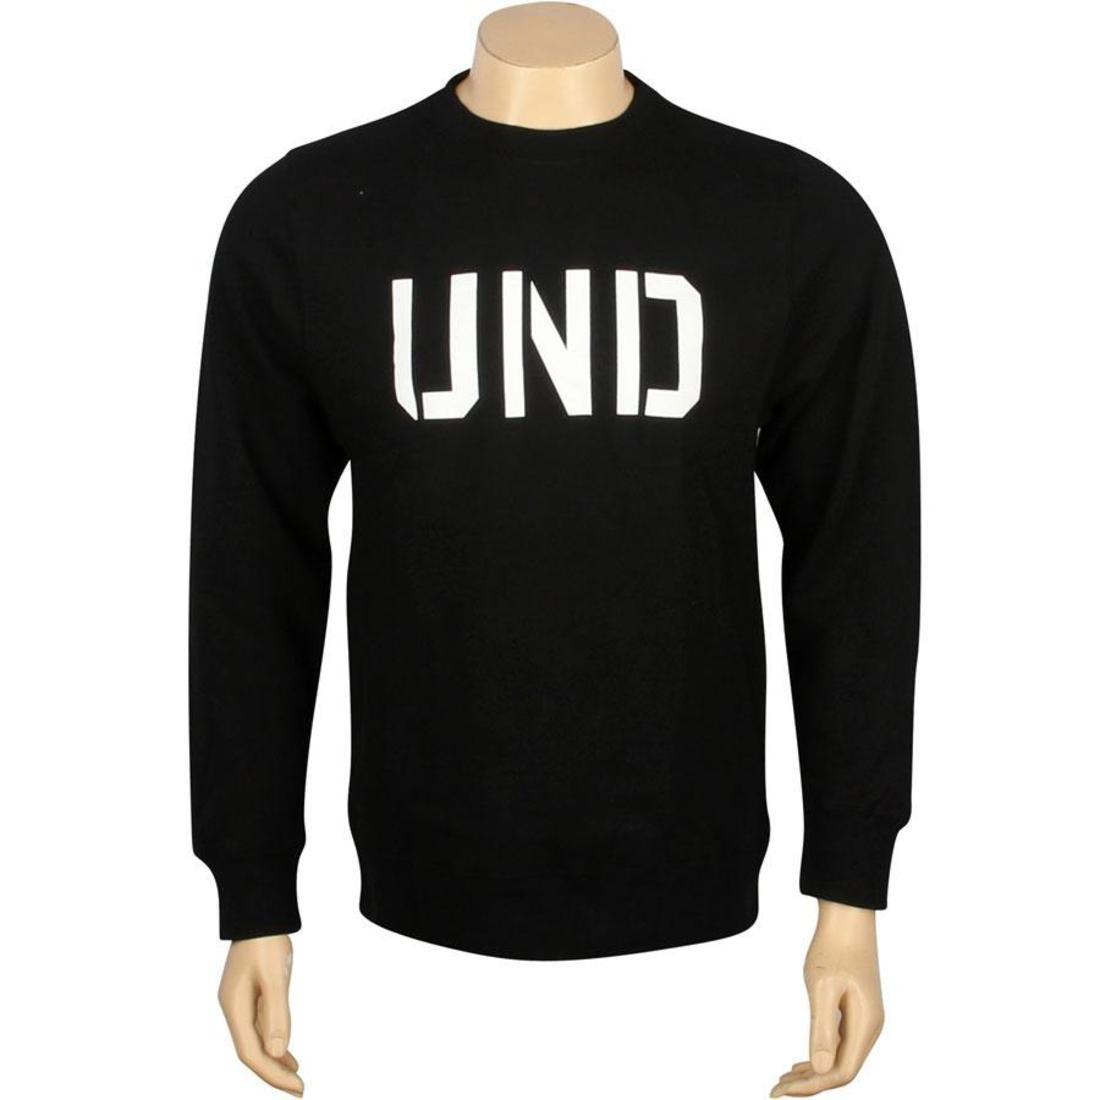 UNDEFEATED 黒 ブラック 【 BLACK UNDEFEATED UND BASIC PULLOVER CREWNECK 】 メンズファッション トップス Tシャツ カットソー